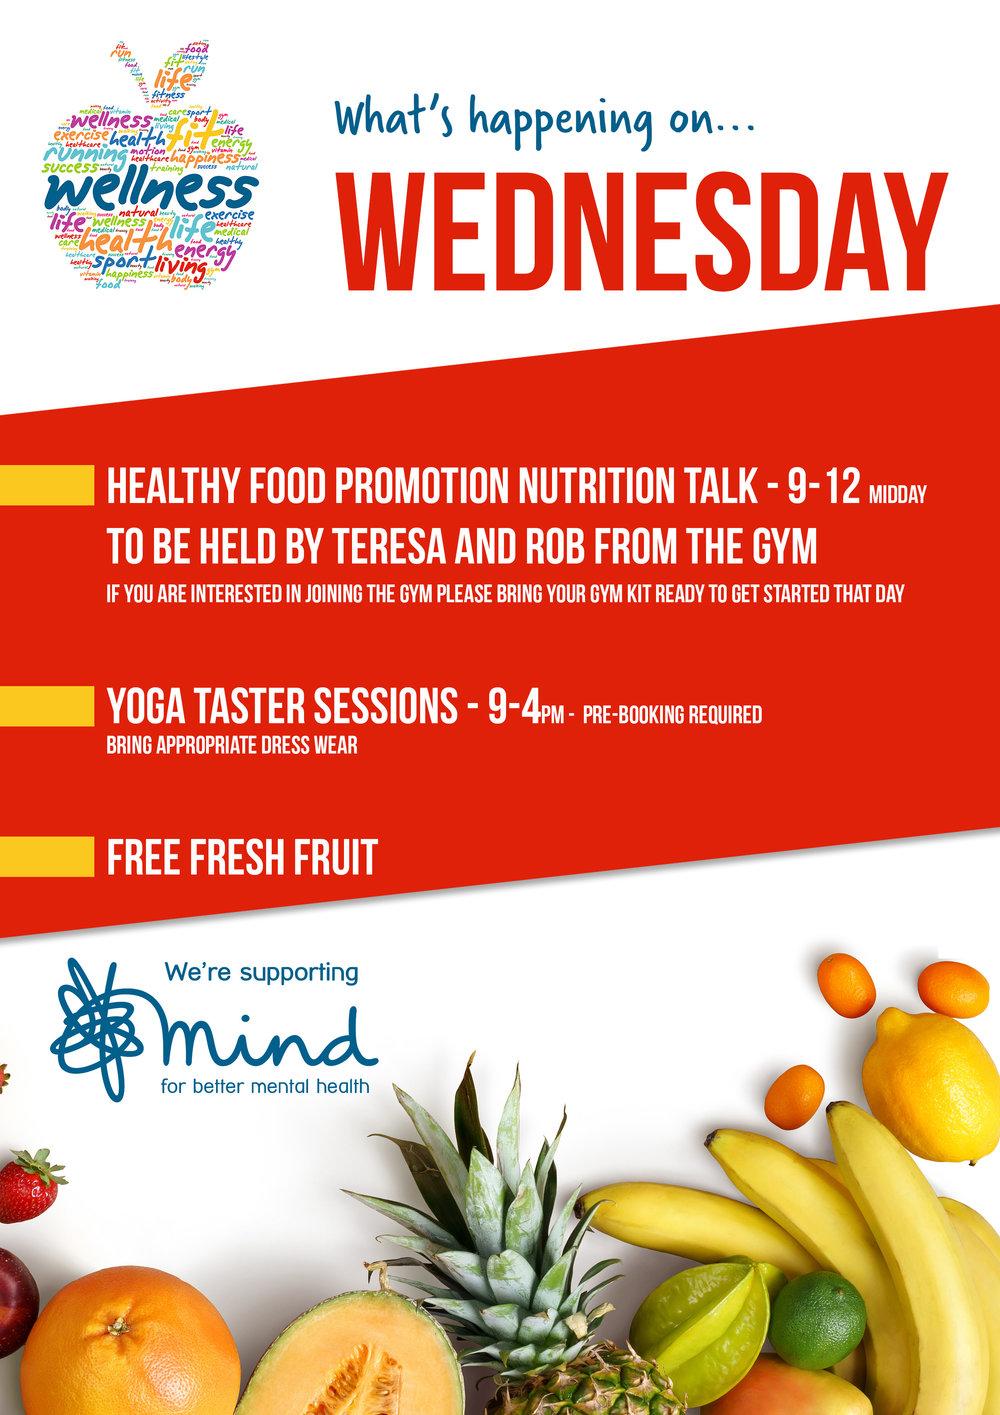 Wellness Week - Wednesday.jpg